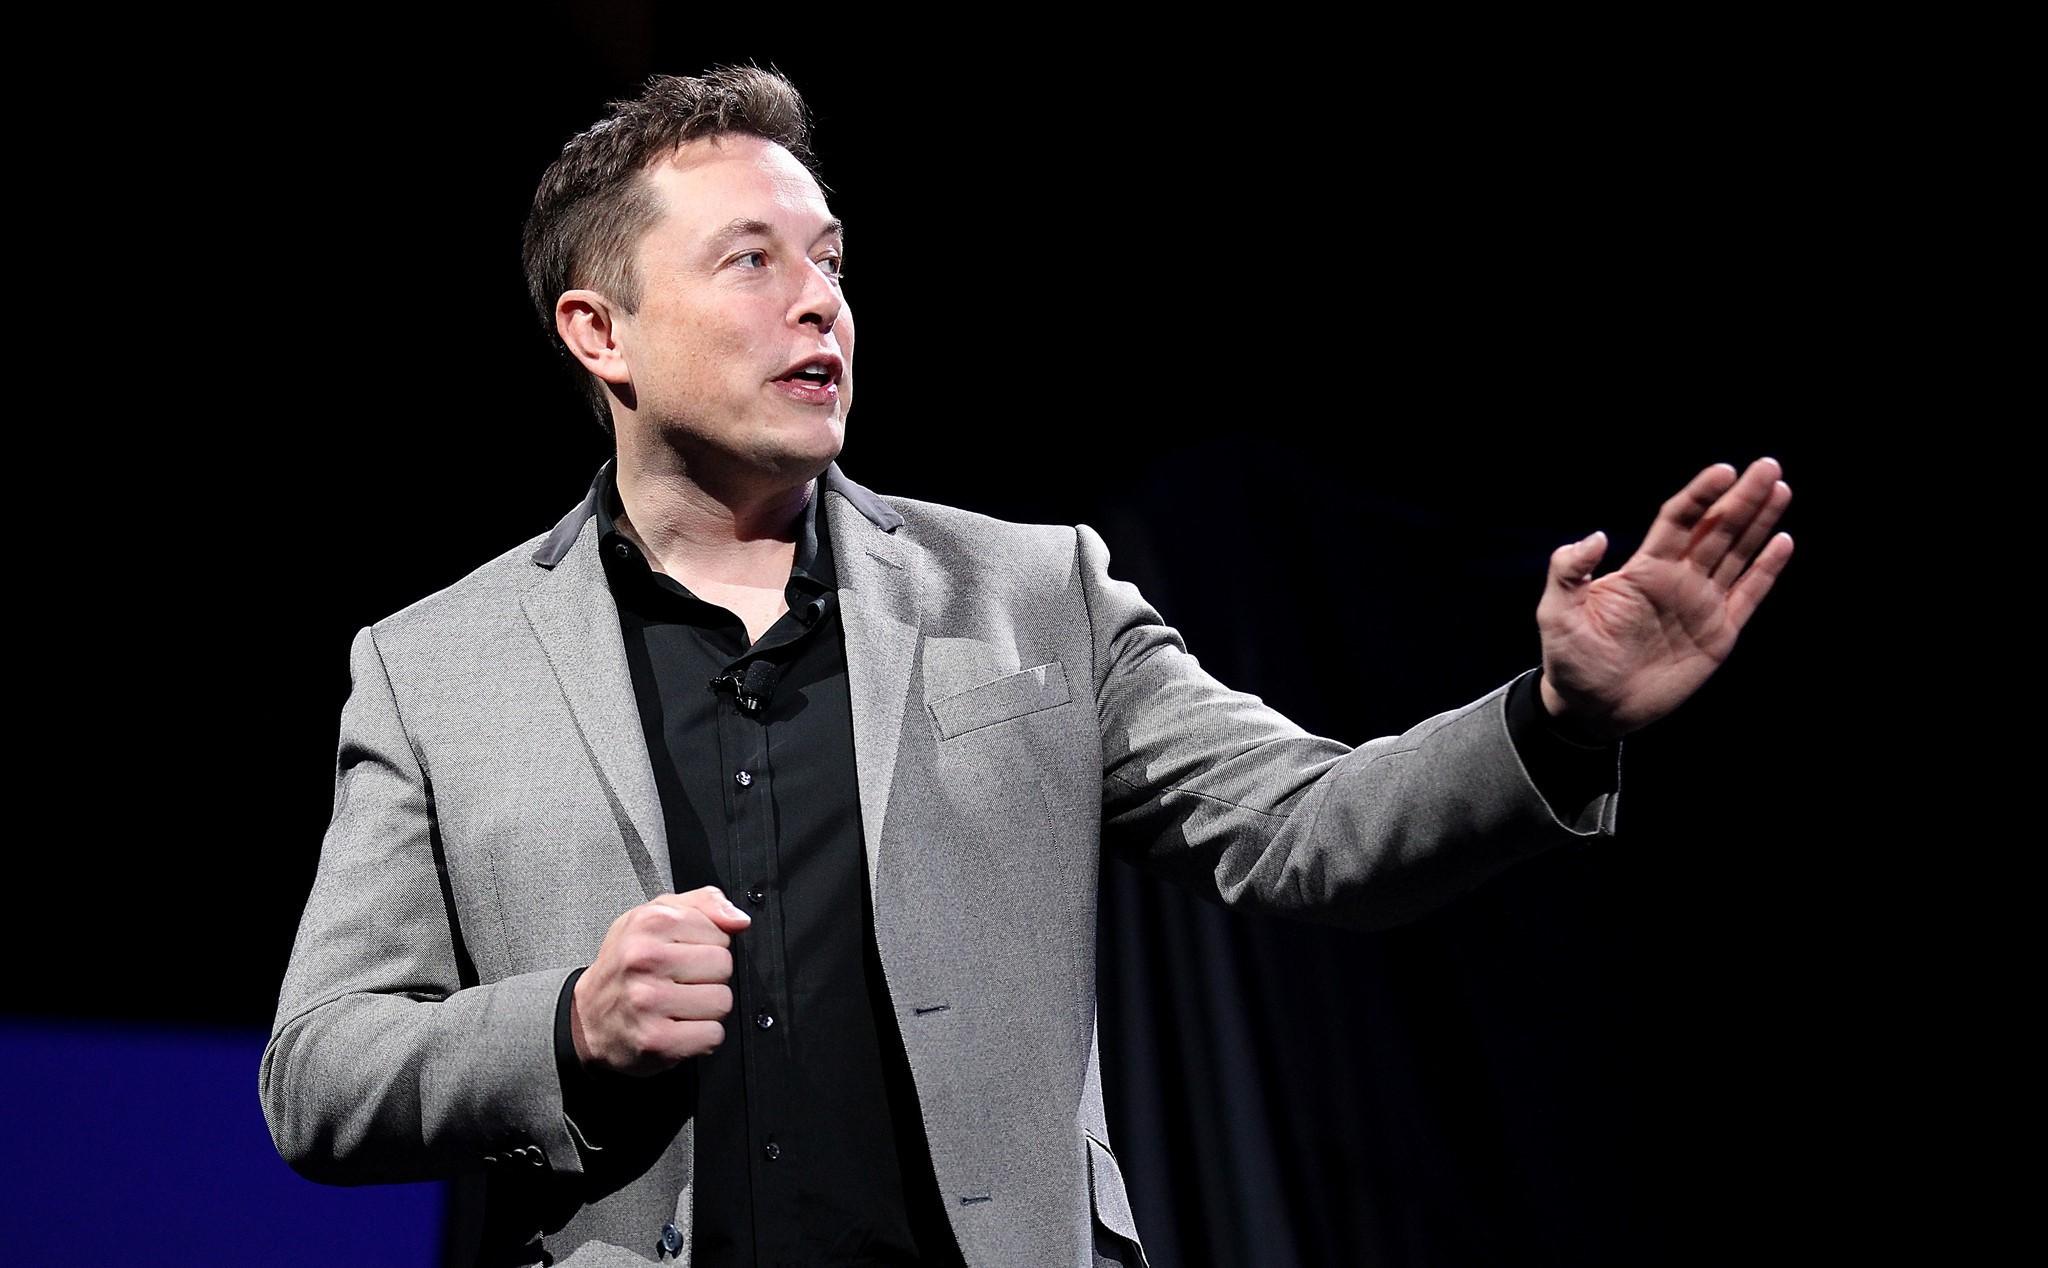 Elon Musk Wallpapers for Windows